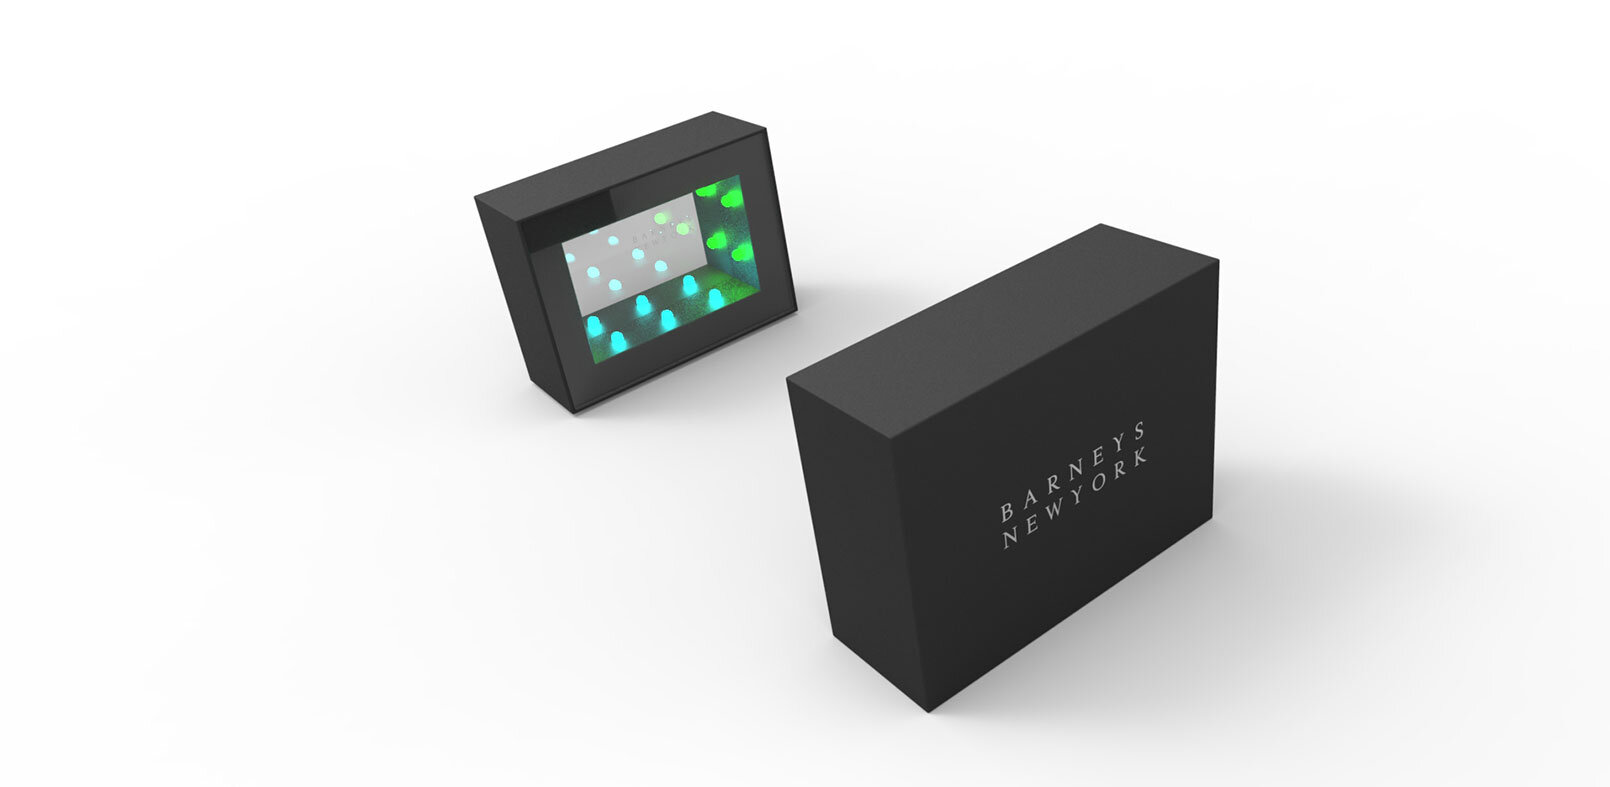 Barneys-New-York-Disney-Holiday-Packaging-Company-Design-7.jpg